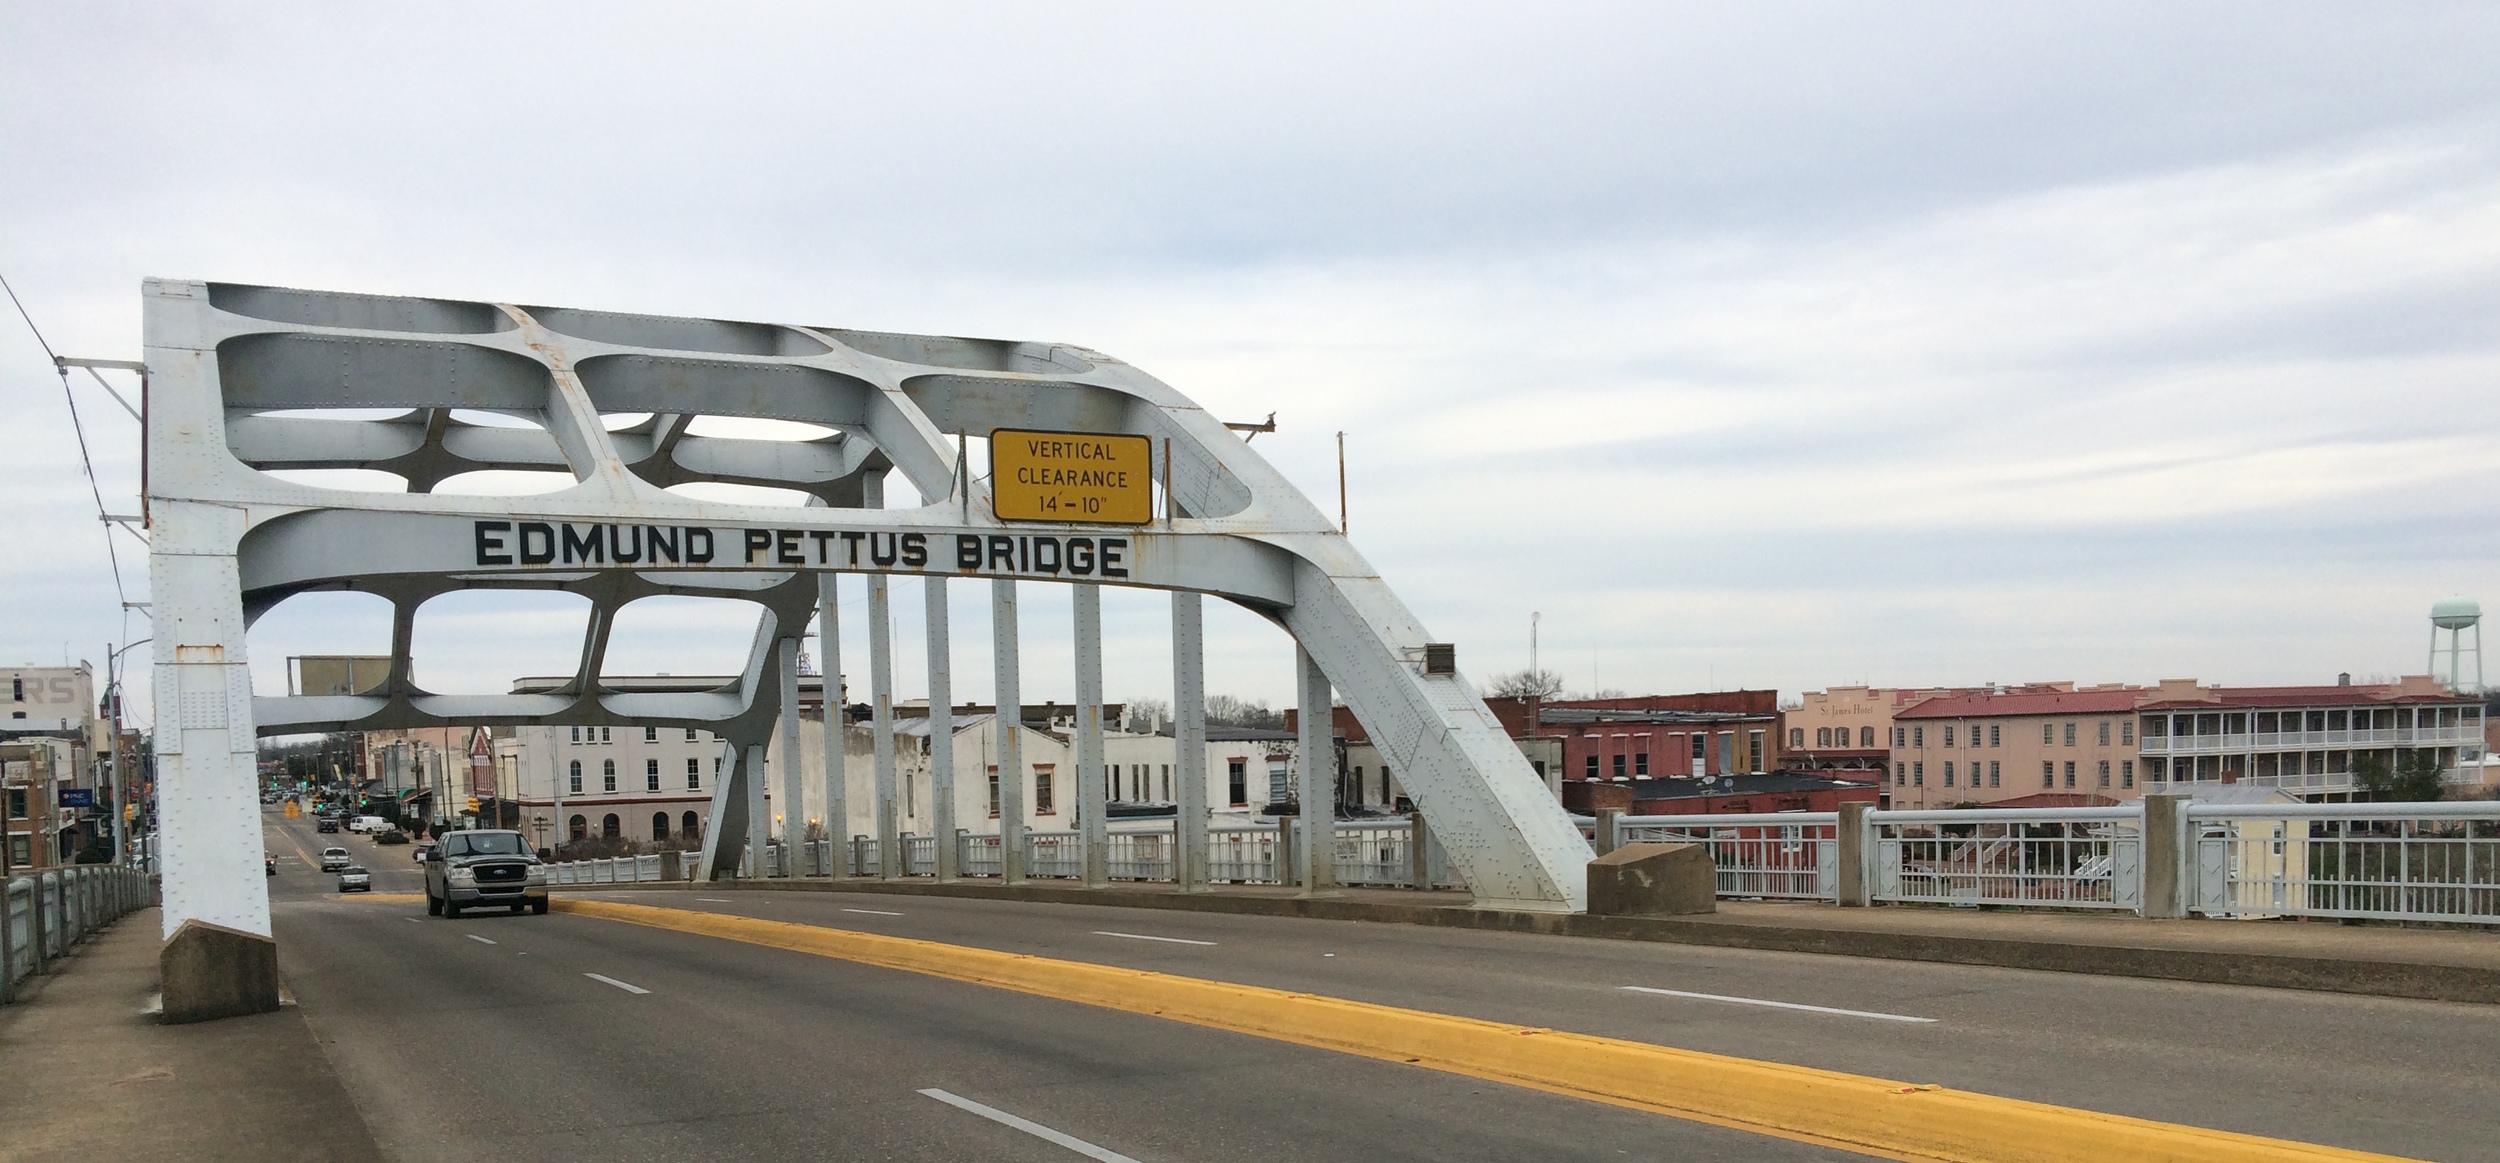 The historic Edmund Pettus Bridge, an important setting and film location for  Selma  - image via  Google .